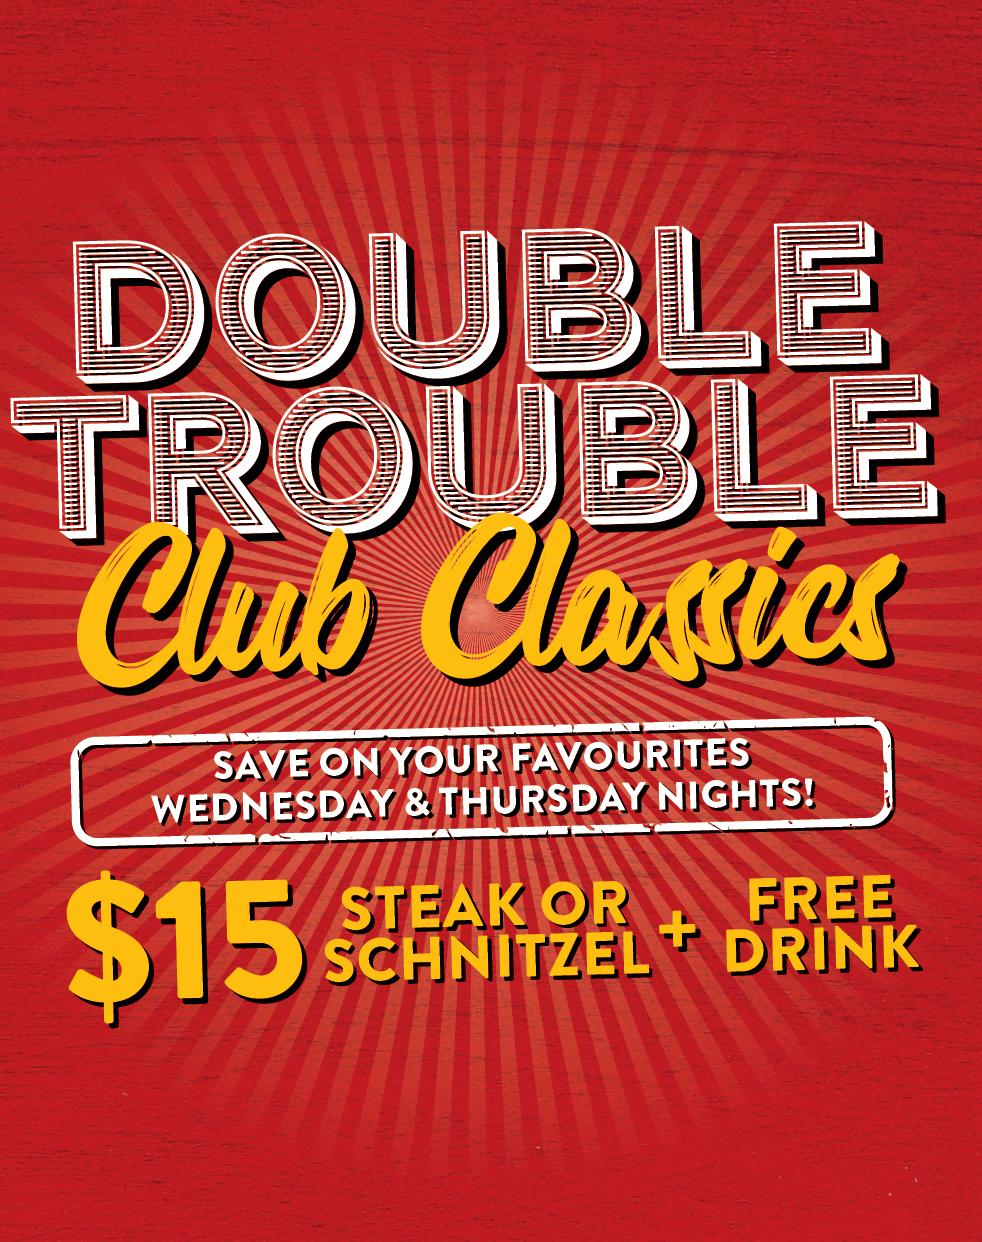 Double Trouble Club Classics